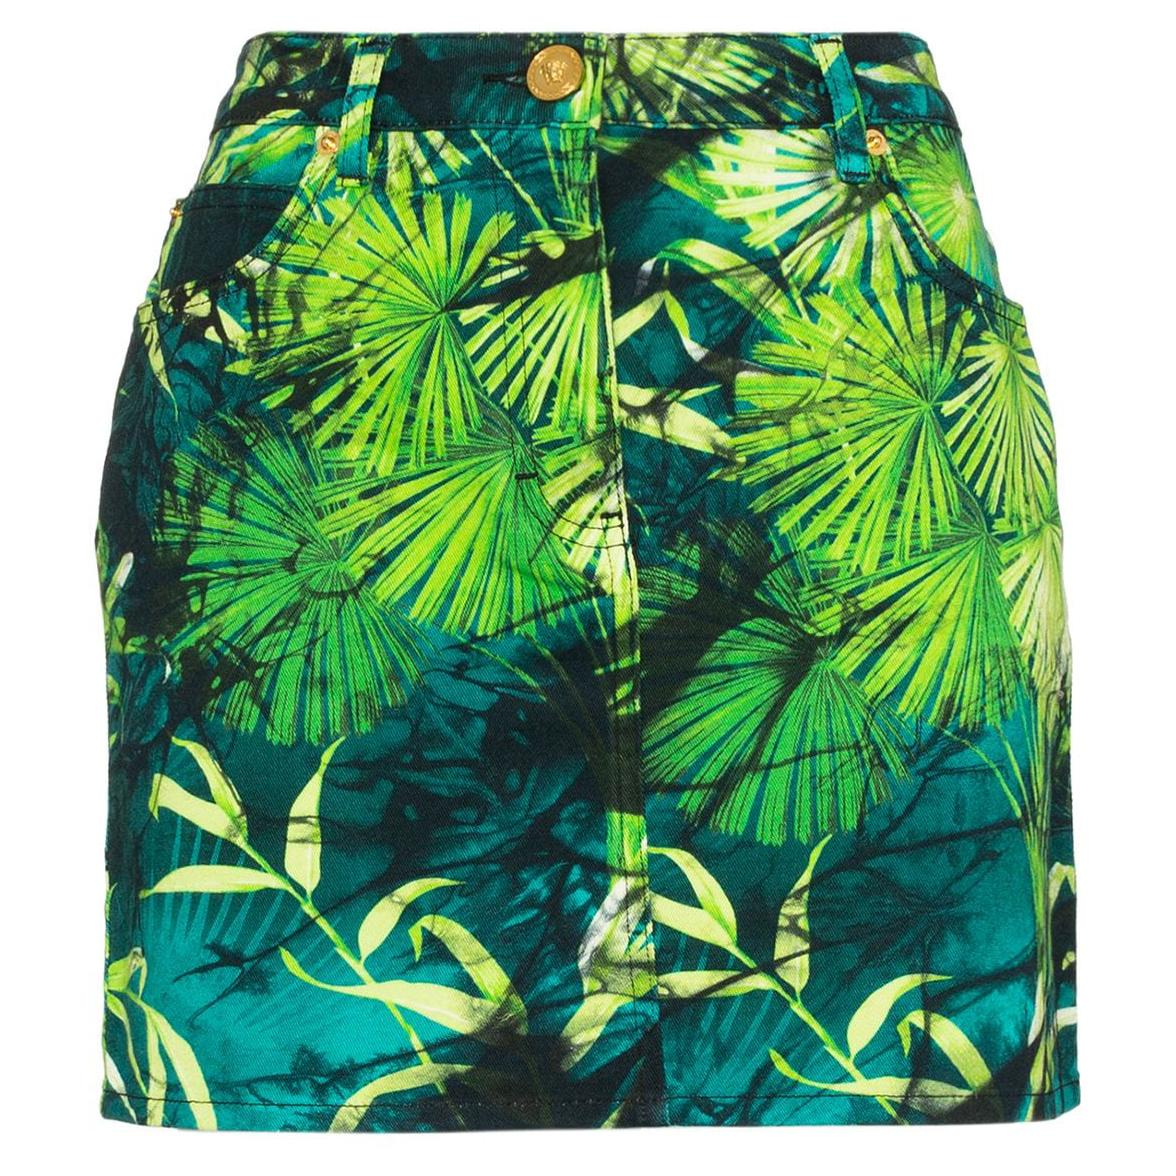 Versace Spring 2020 Runway Verde Jungle Print Denim Mini Skirt Size 40